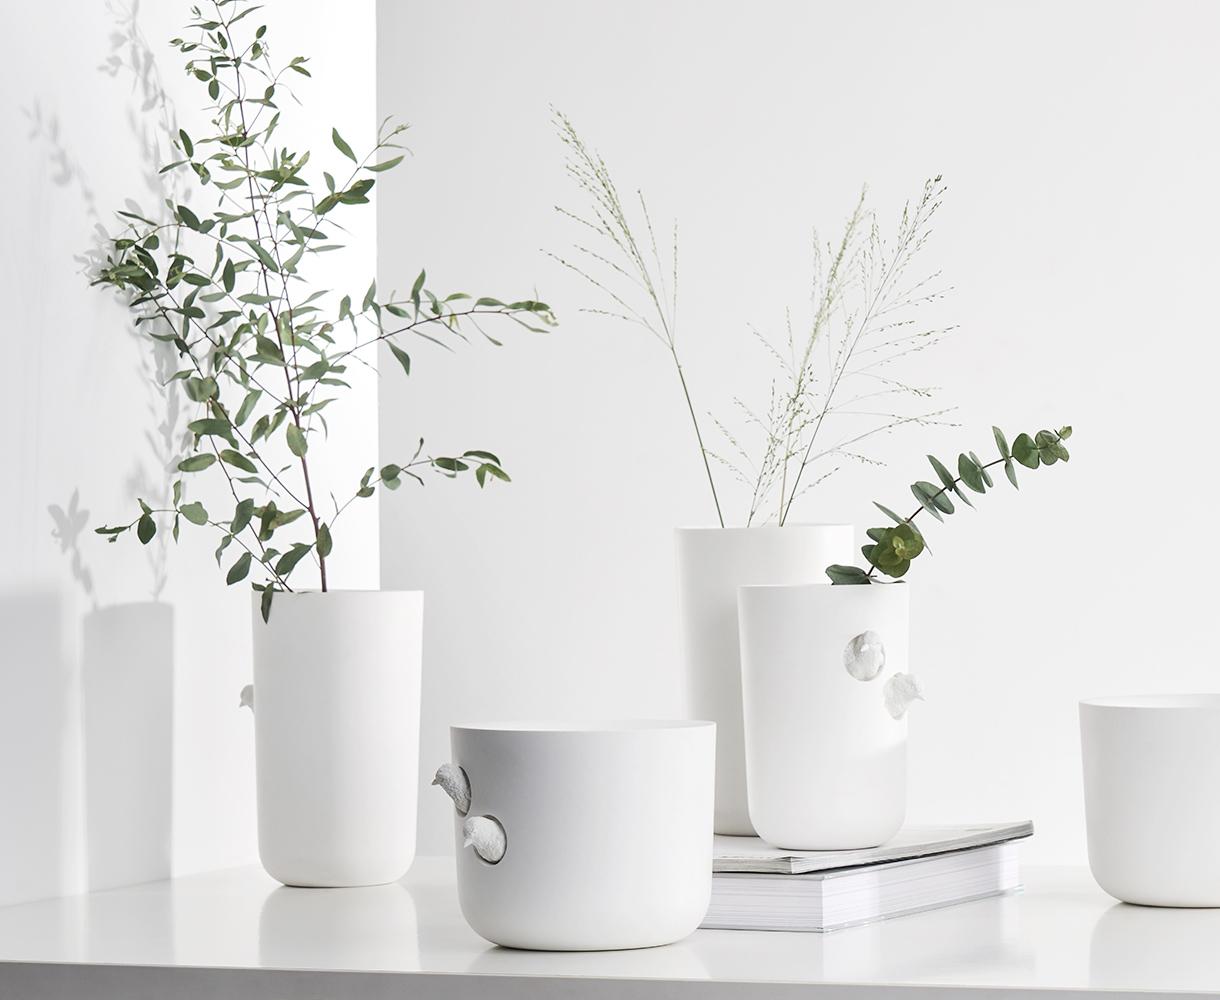 Sparrow X Vase